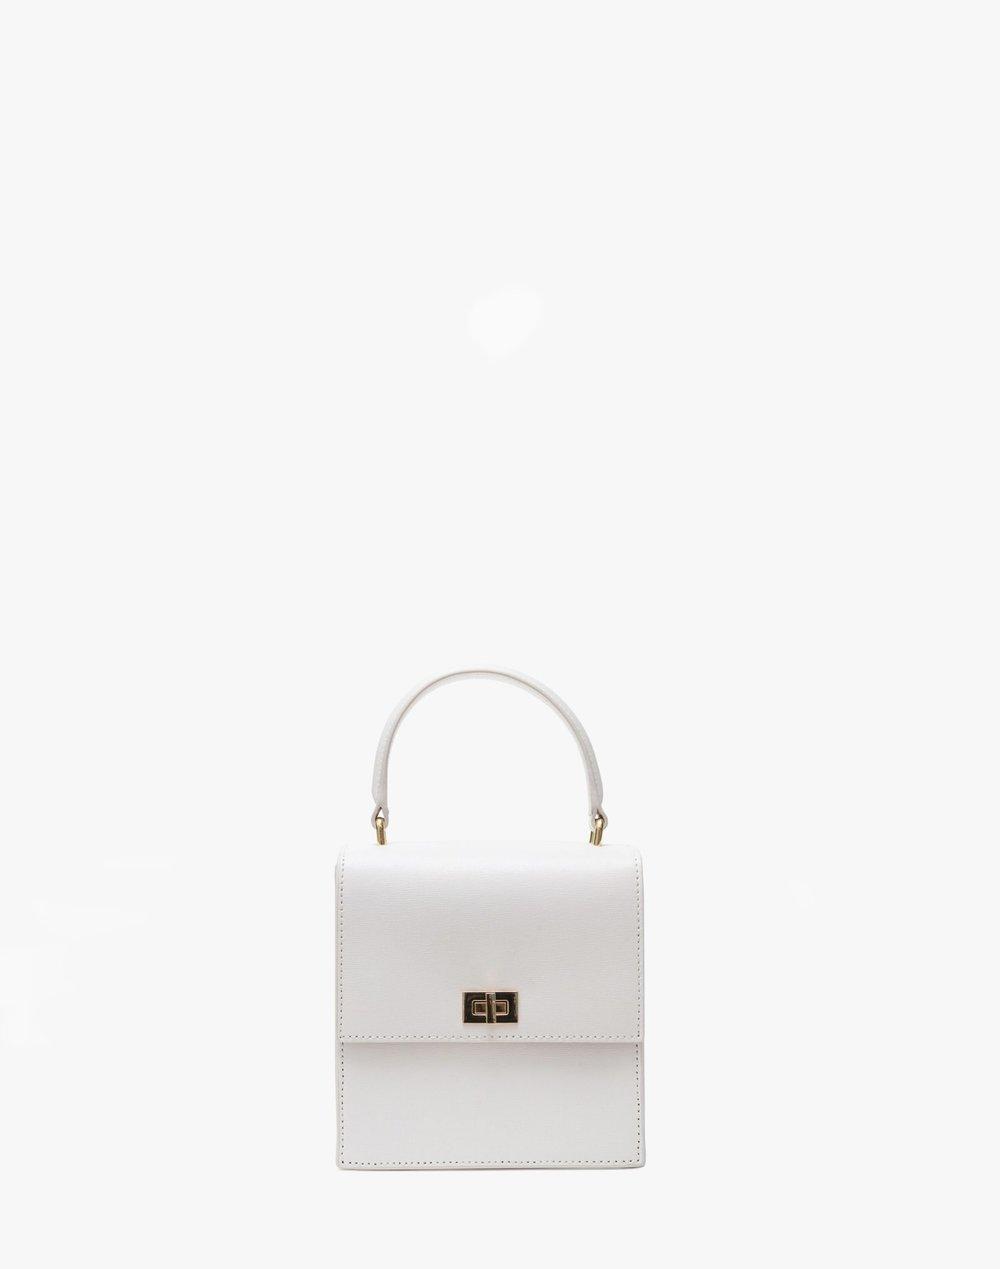 Mini_Ladybag_white2-800x1015@2x.jpg